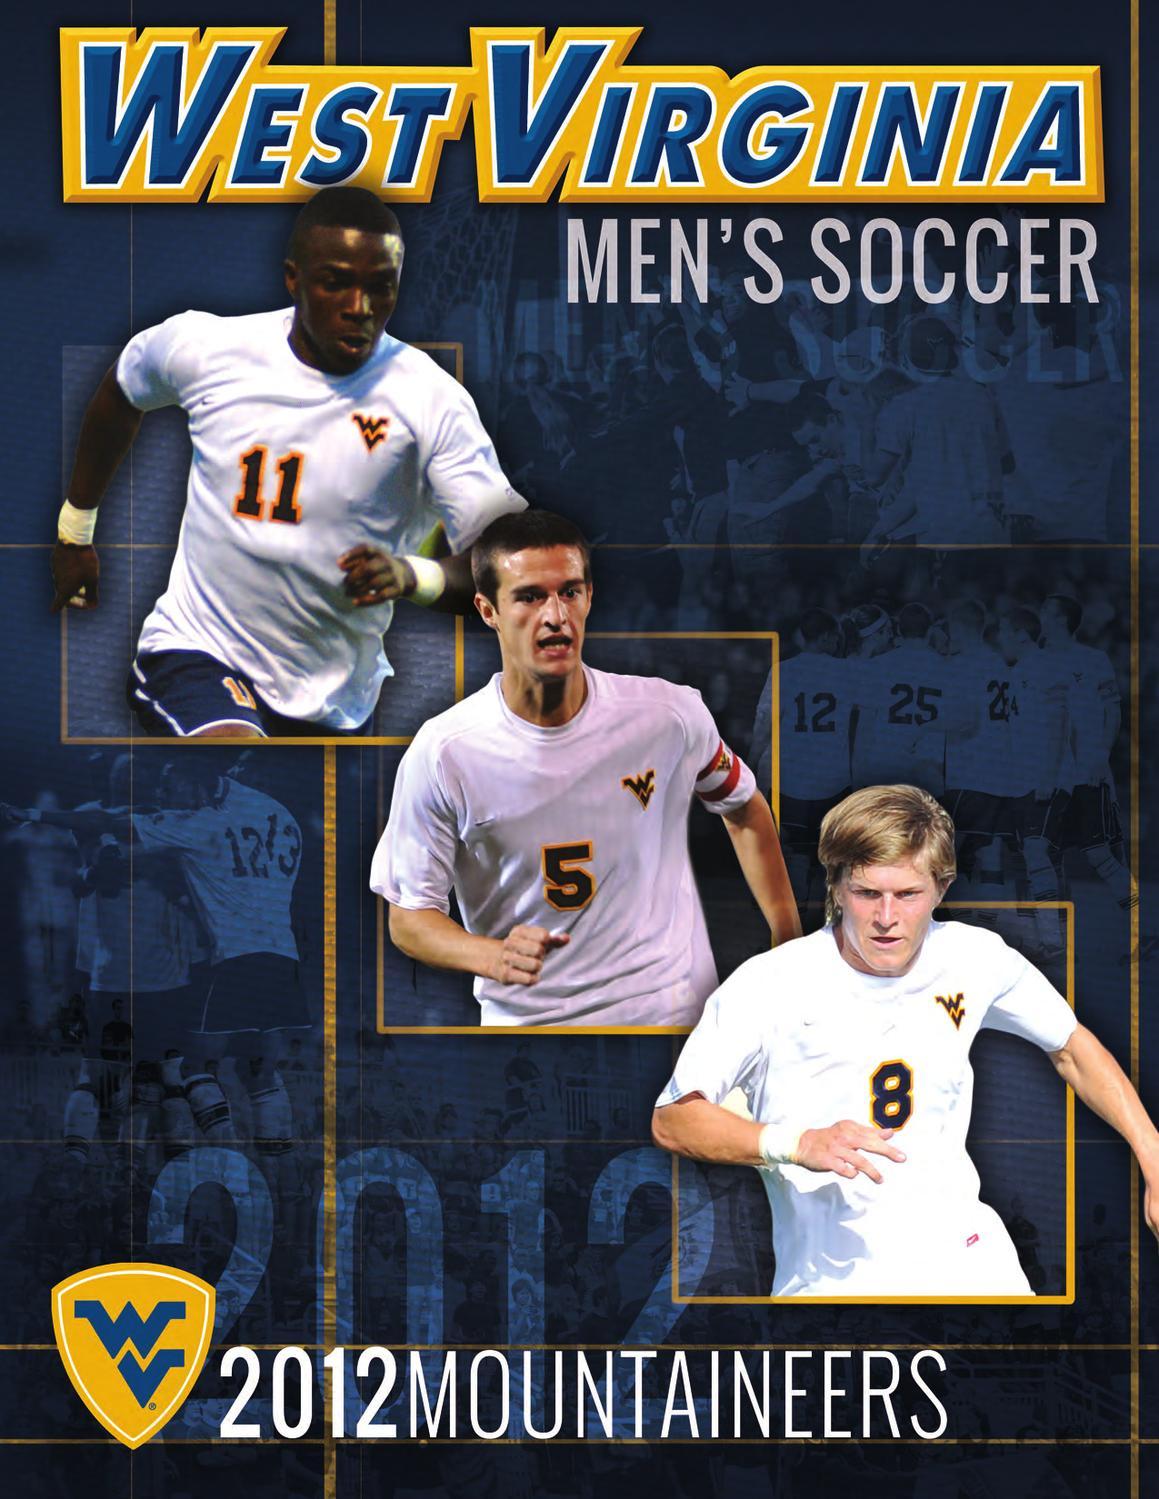 Soccer Guide - Swan 2012 Joe By Men's Wvu Issuu aedbdeceebaaf|The Gridiron Uniform Database